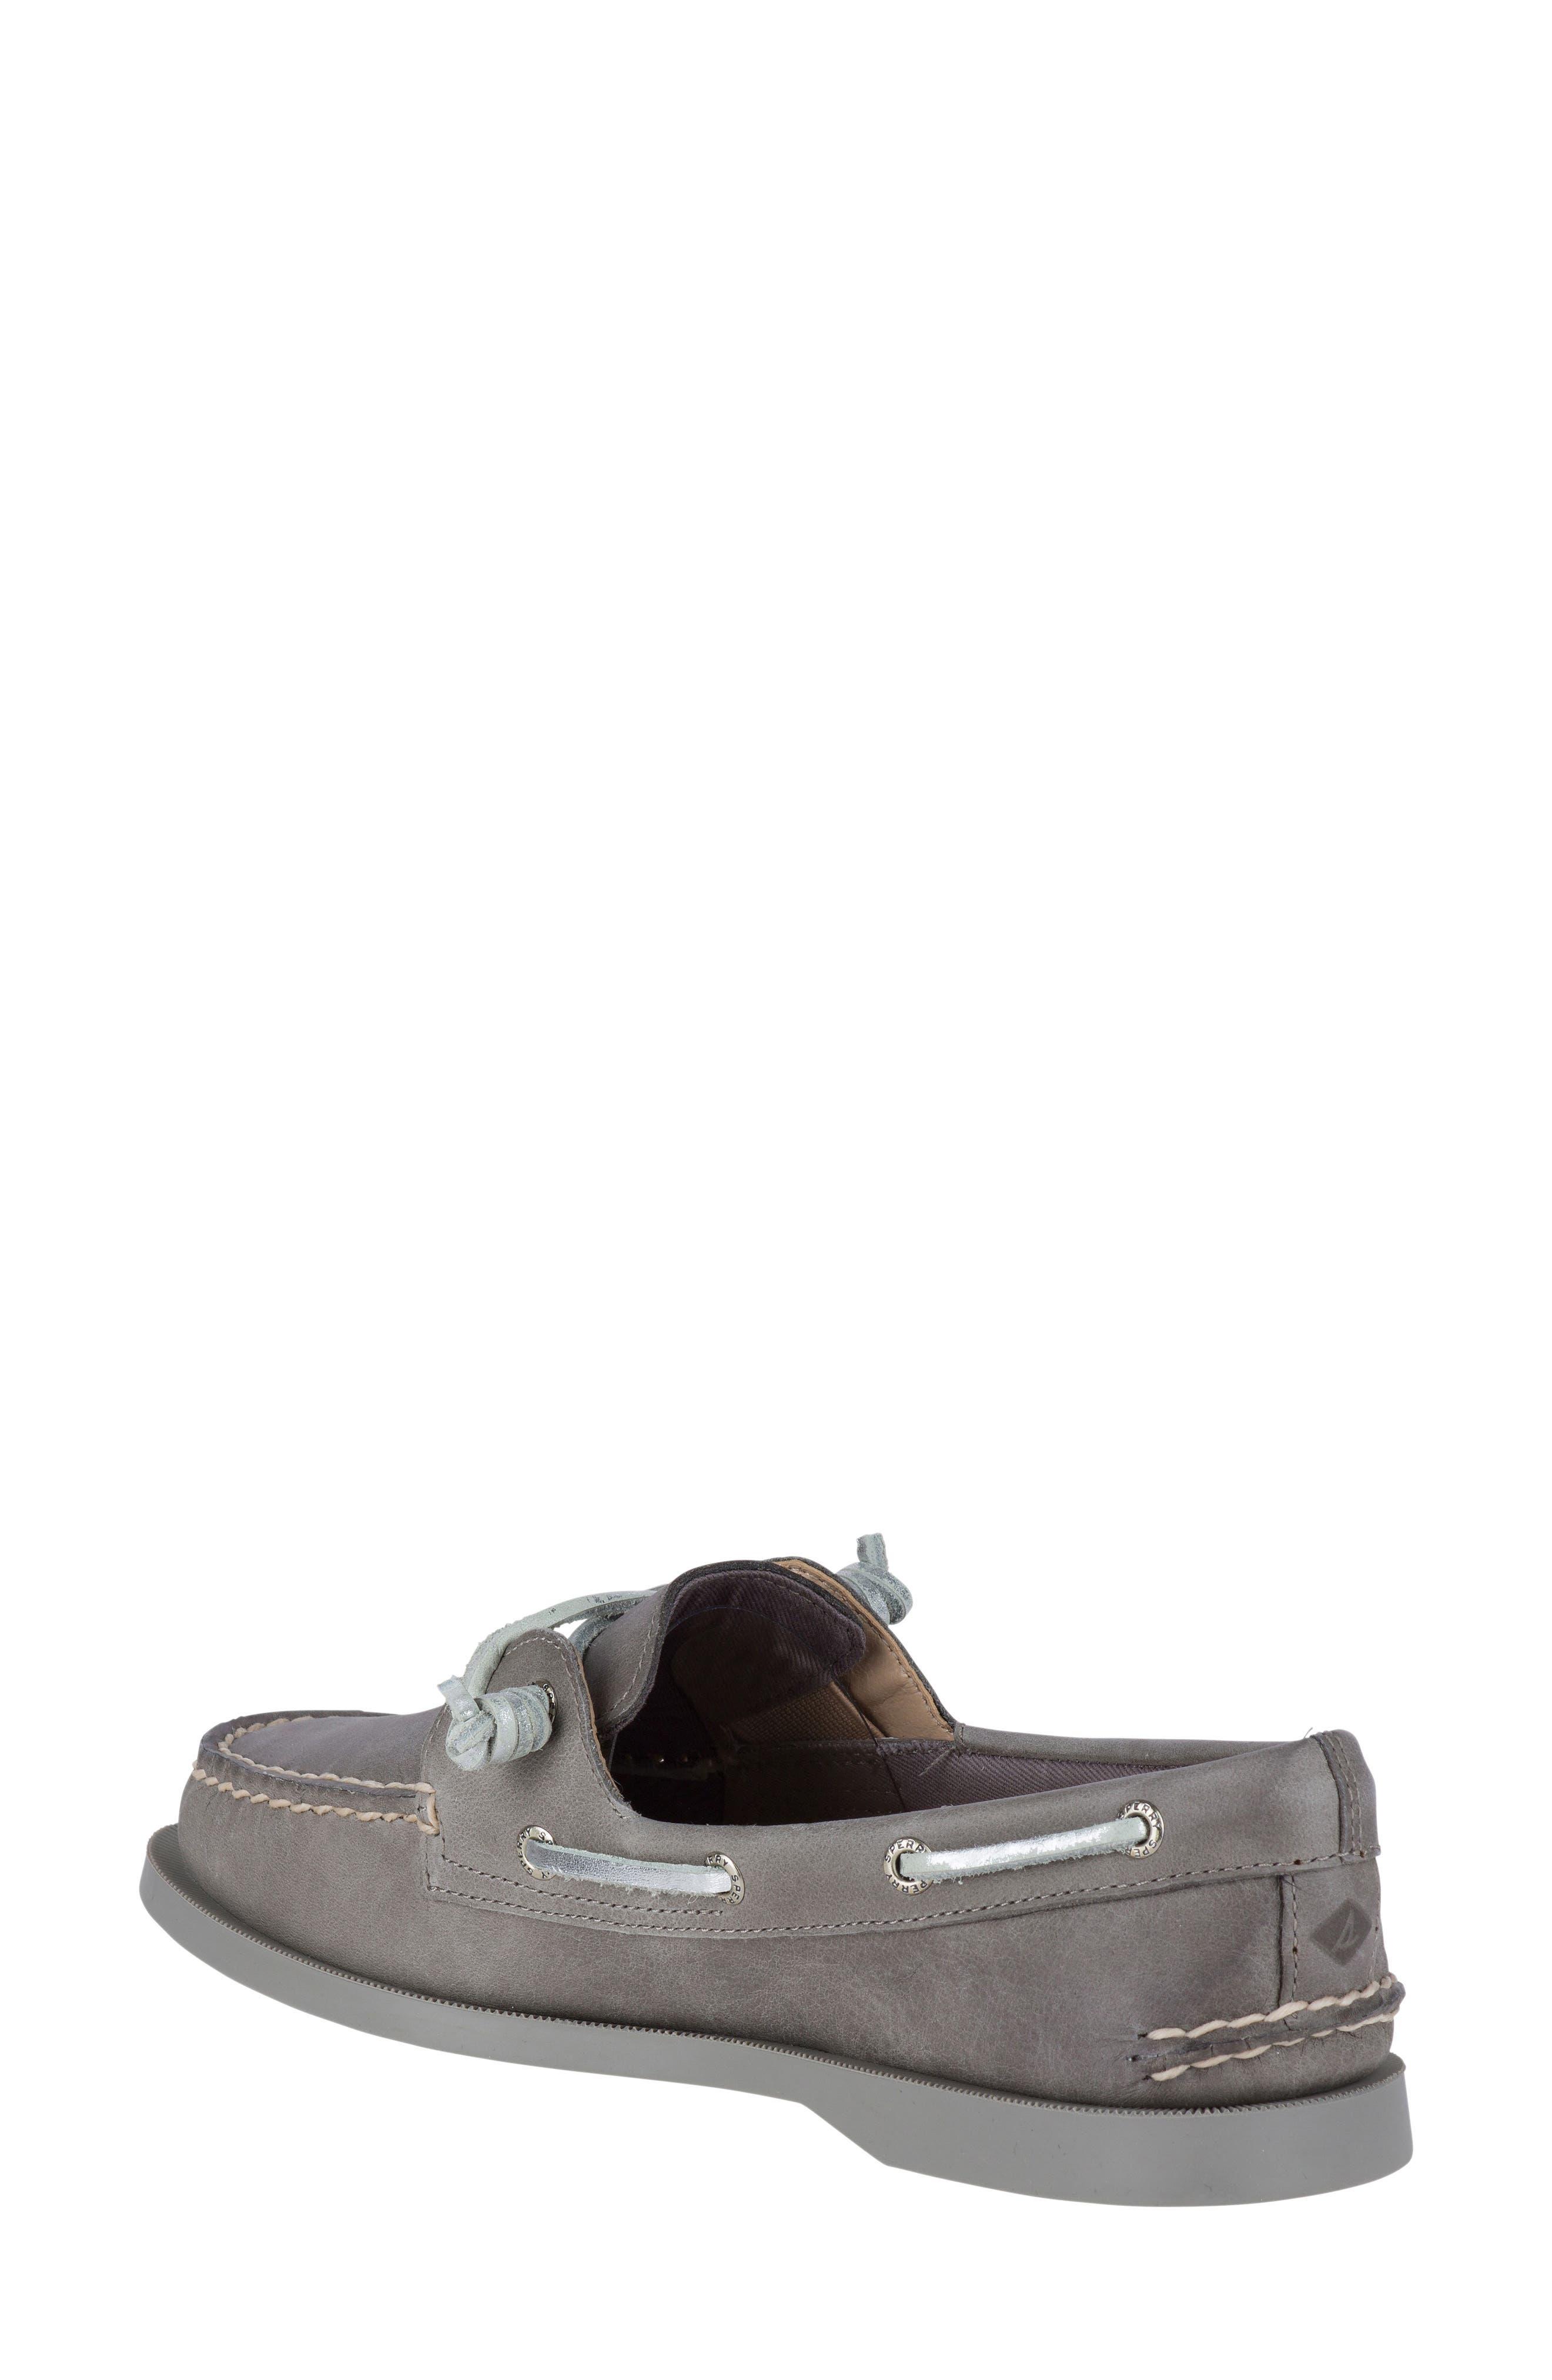 Vida Boat Shoe,                             Alternate thumbnail 2, color,                             Driftwood Leather